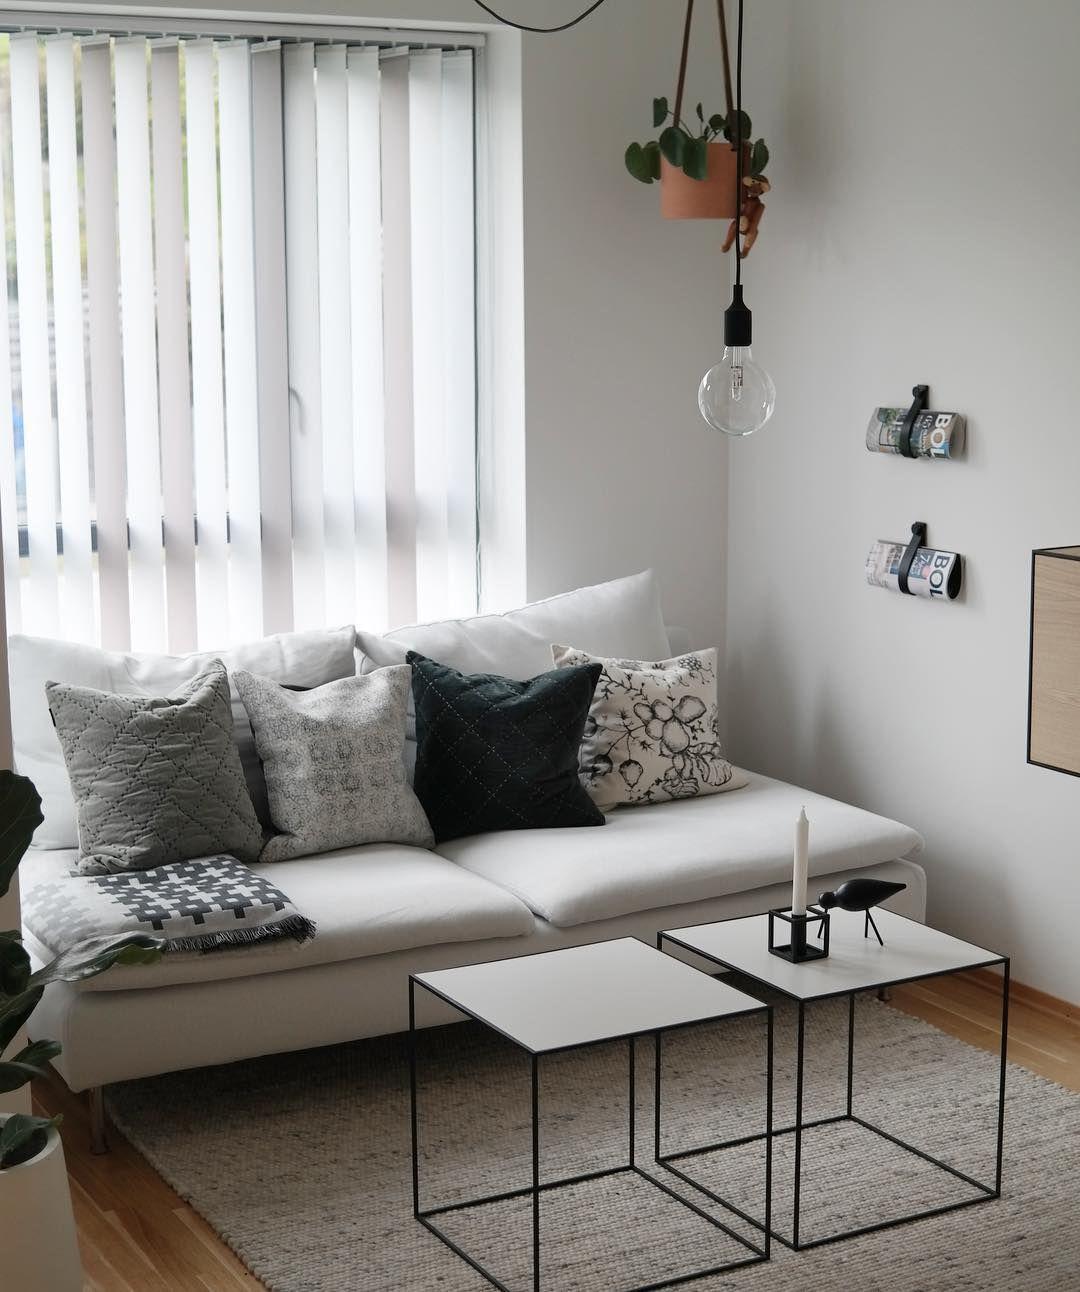 Sofa For Small Space Living Room Ideas: Ikea 'Söderhamn' Sofa @ssevjen